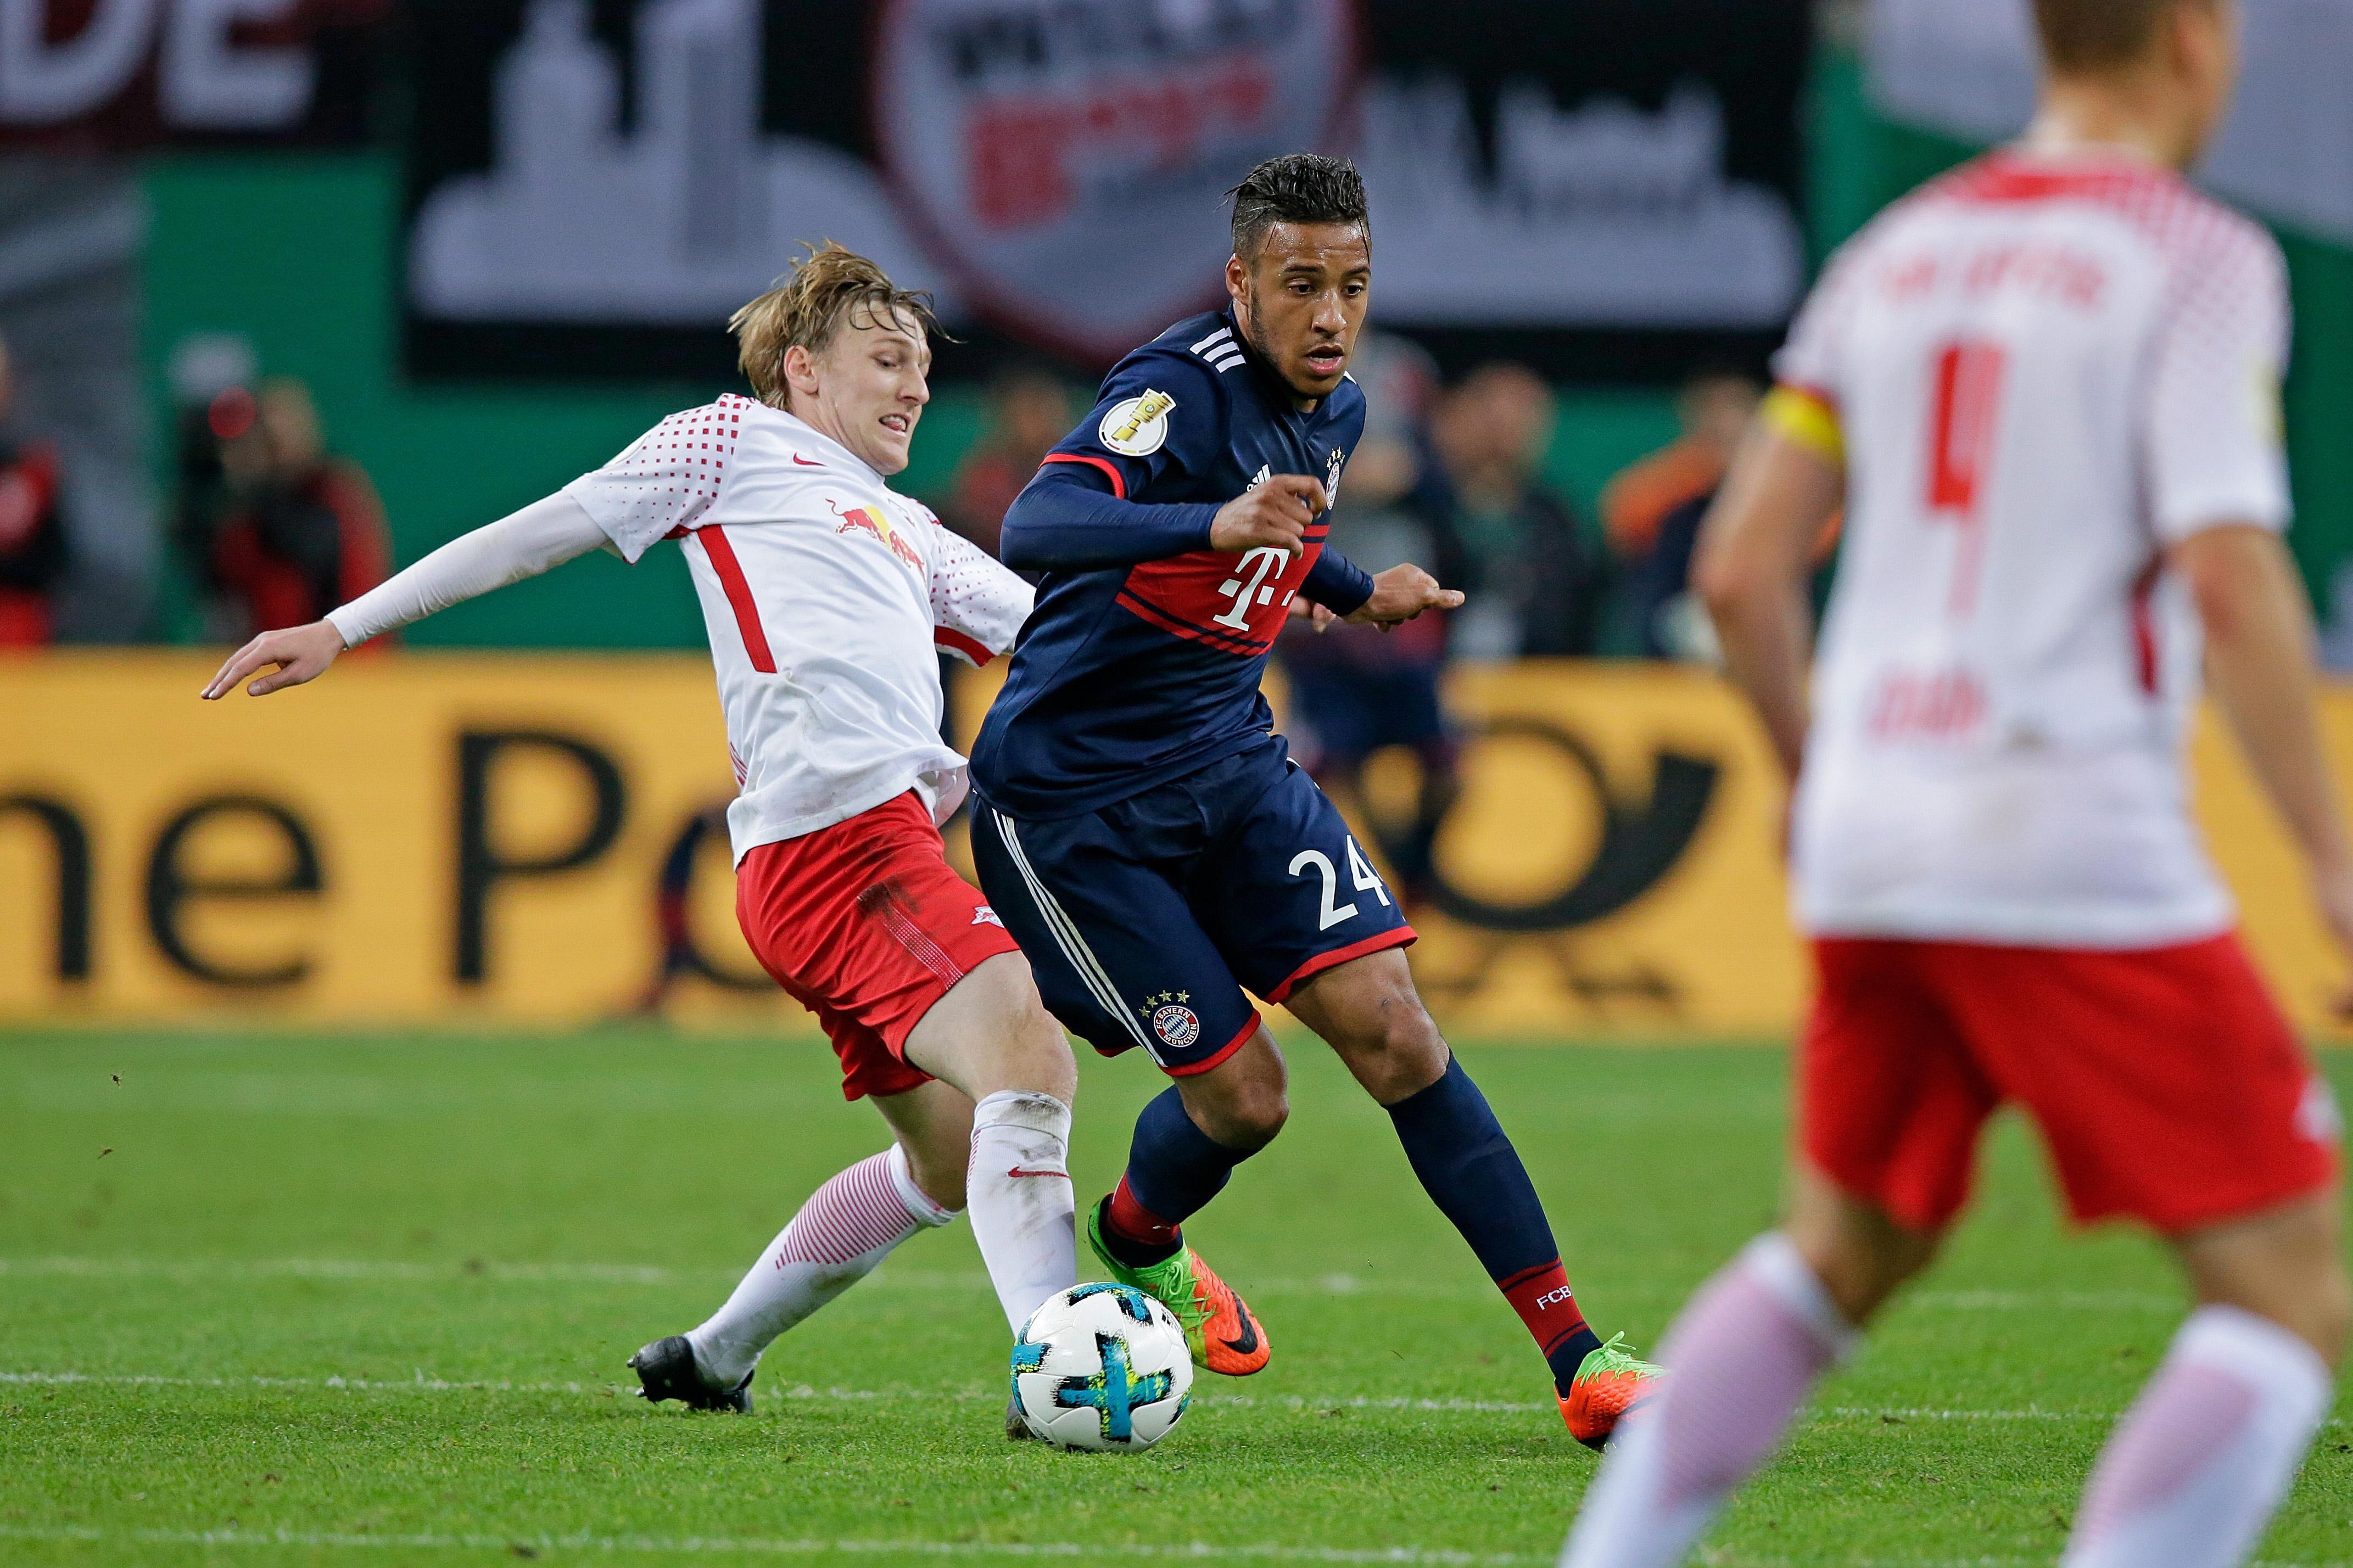 Dfb Pokal Bayern Leipzig